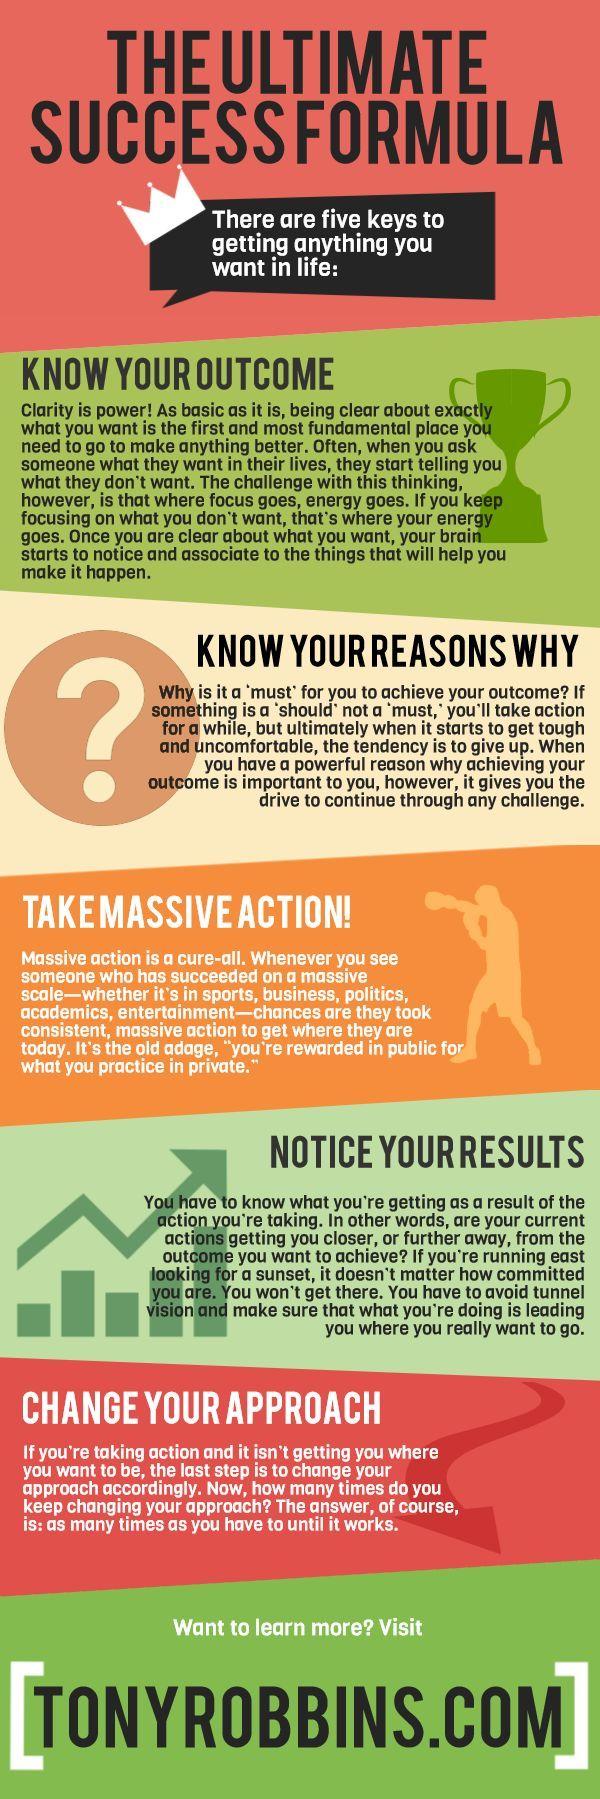 @TonyRobbins - The Ultimate Success Formula #tonyrobbins #unlimitedpower #personaldevelopment